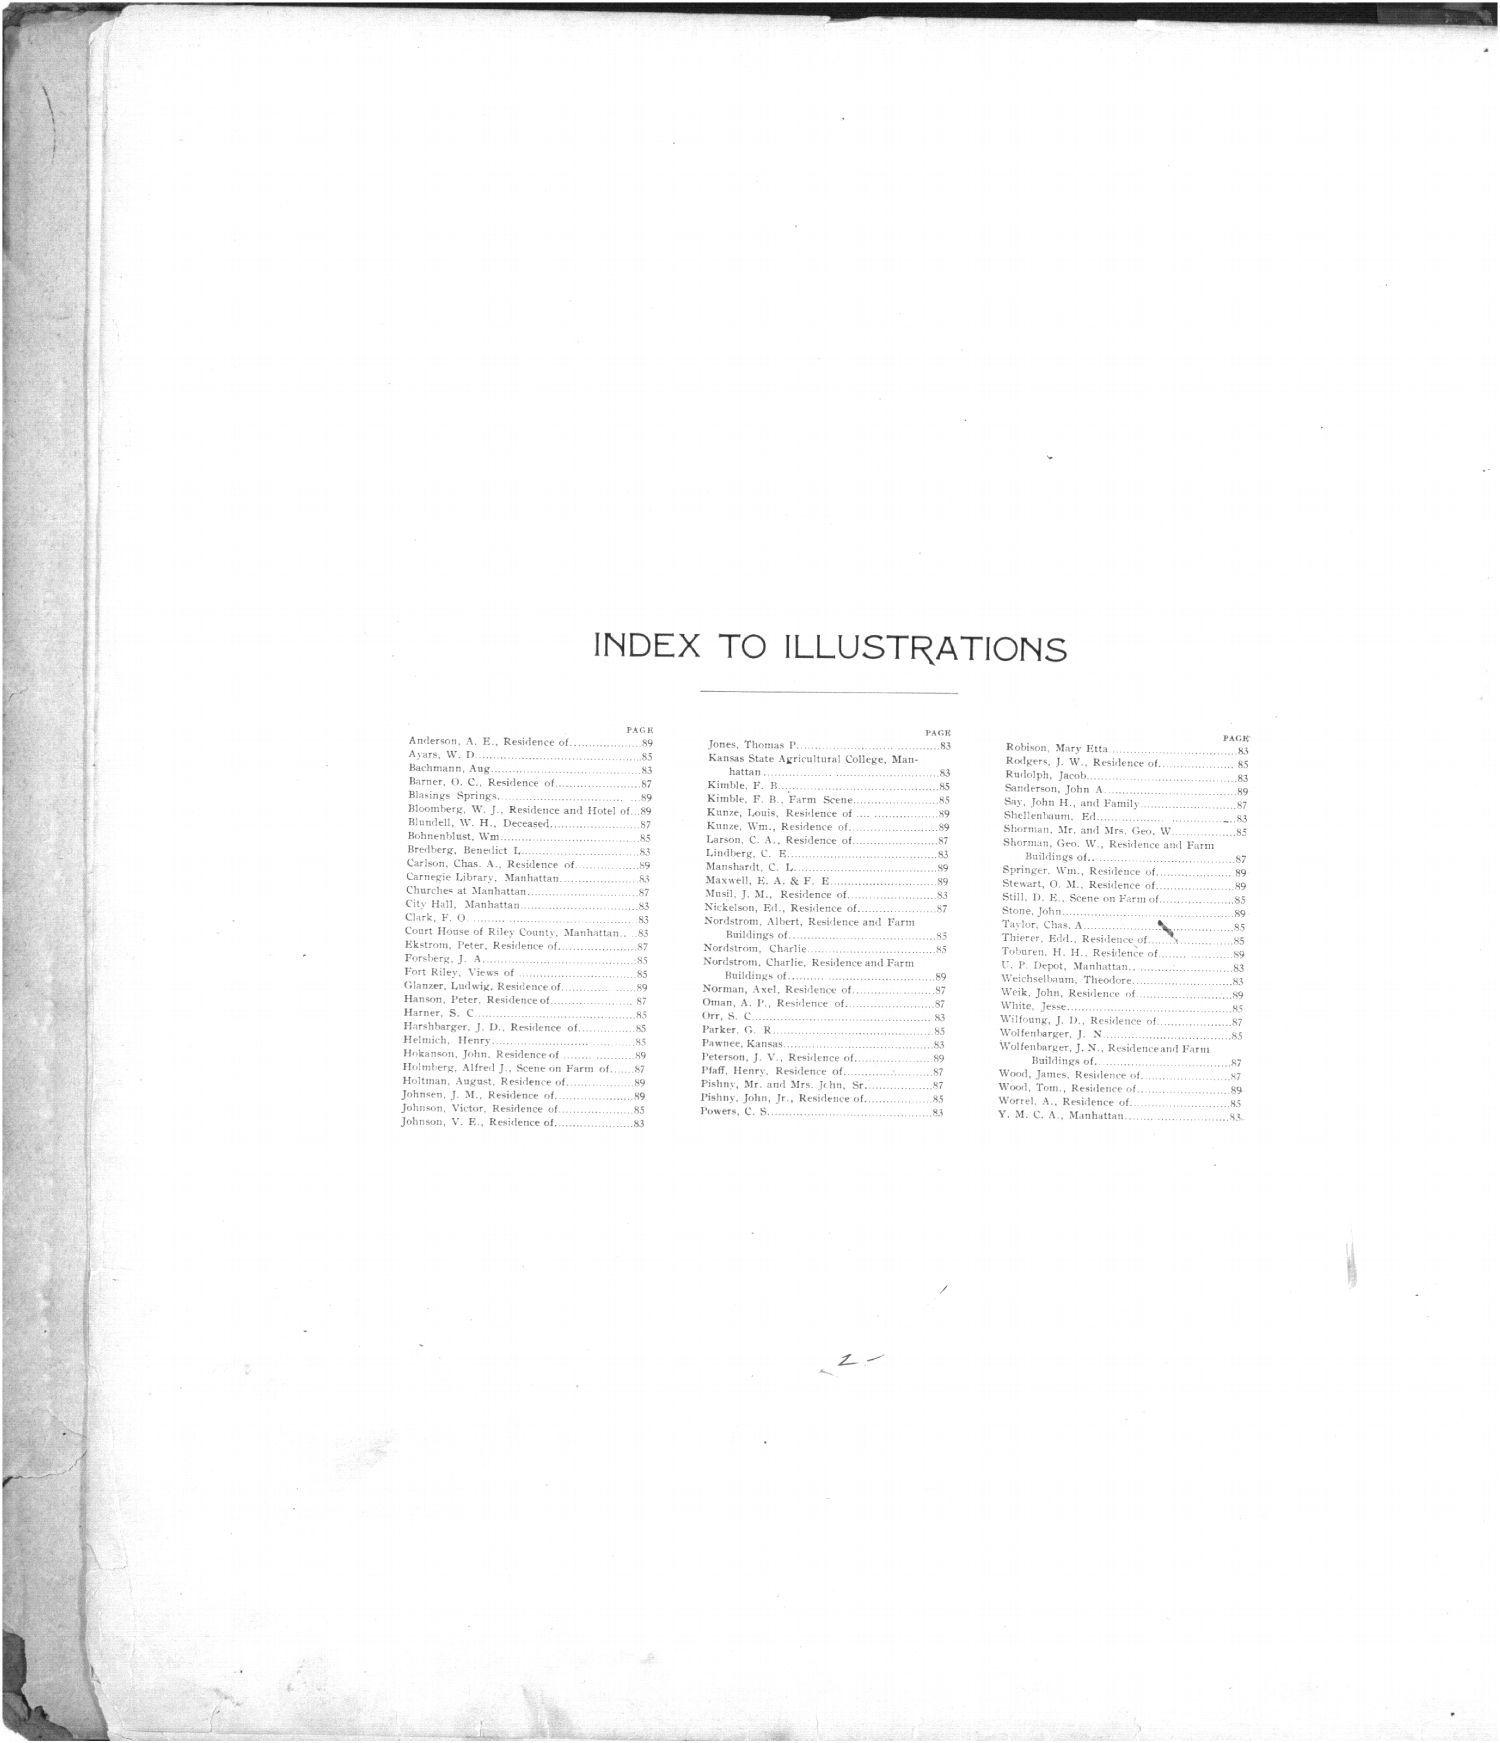 Standard atlas of Riley County, Kansas - Index to Illustrations